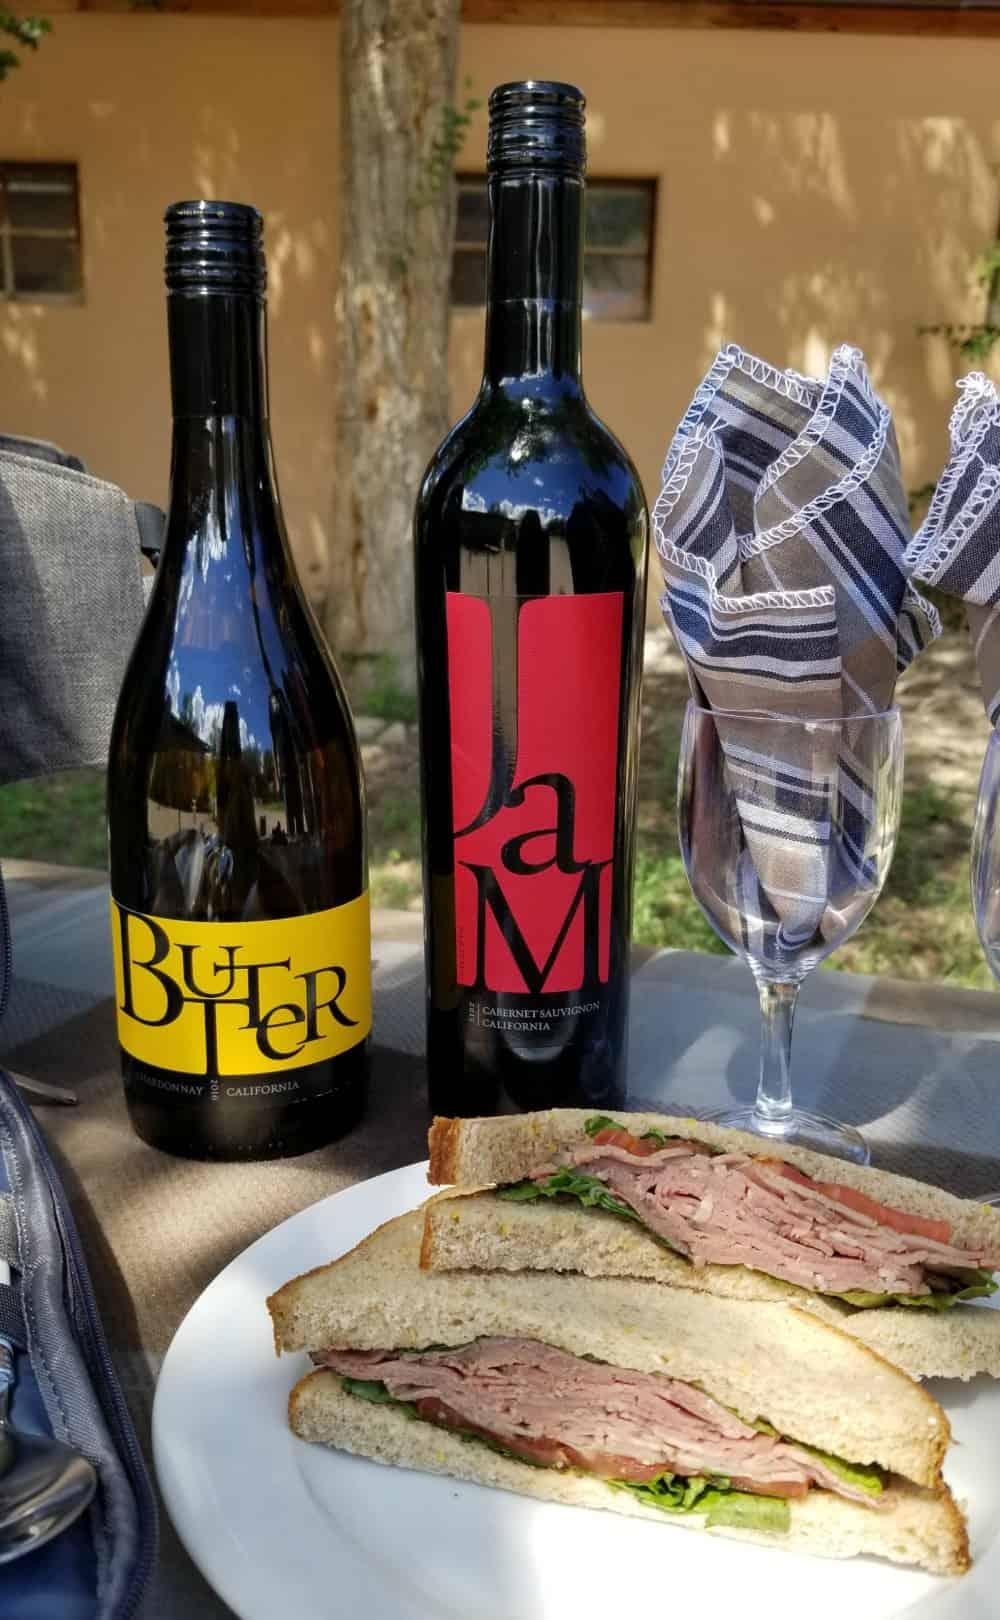 JaM Cellars Wine, JaM Cabernet, Butter Chardonnay